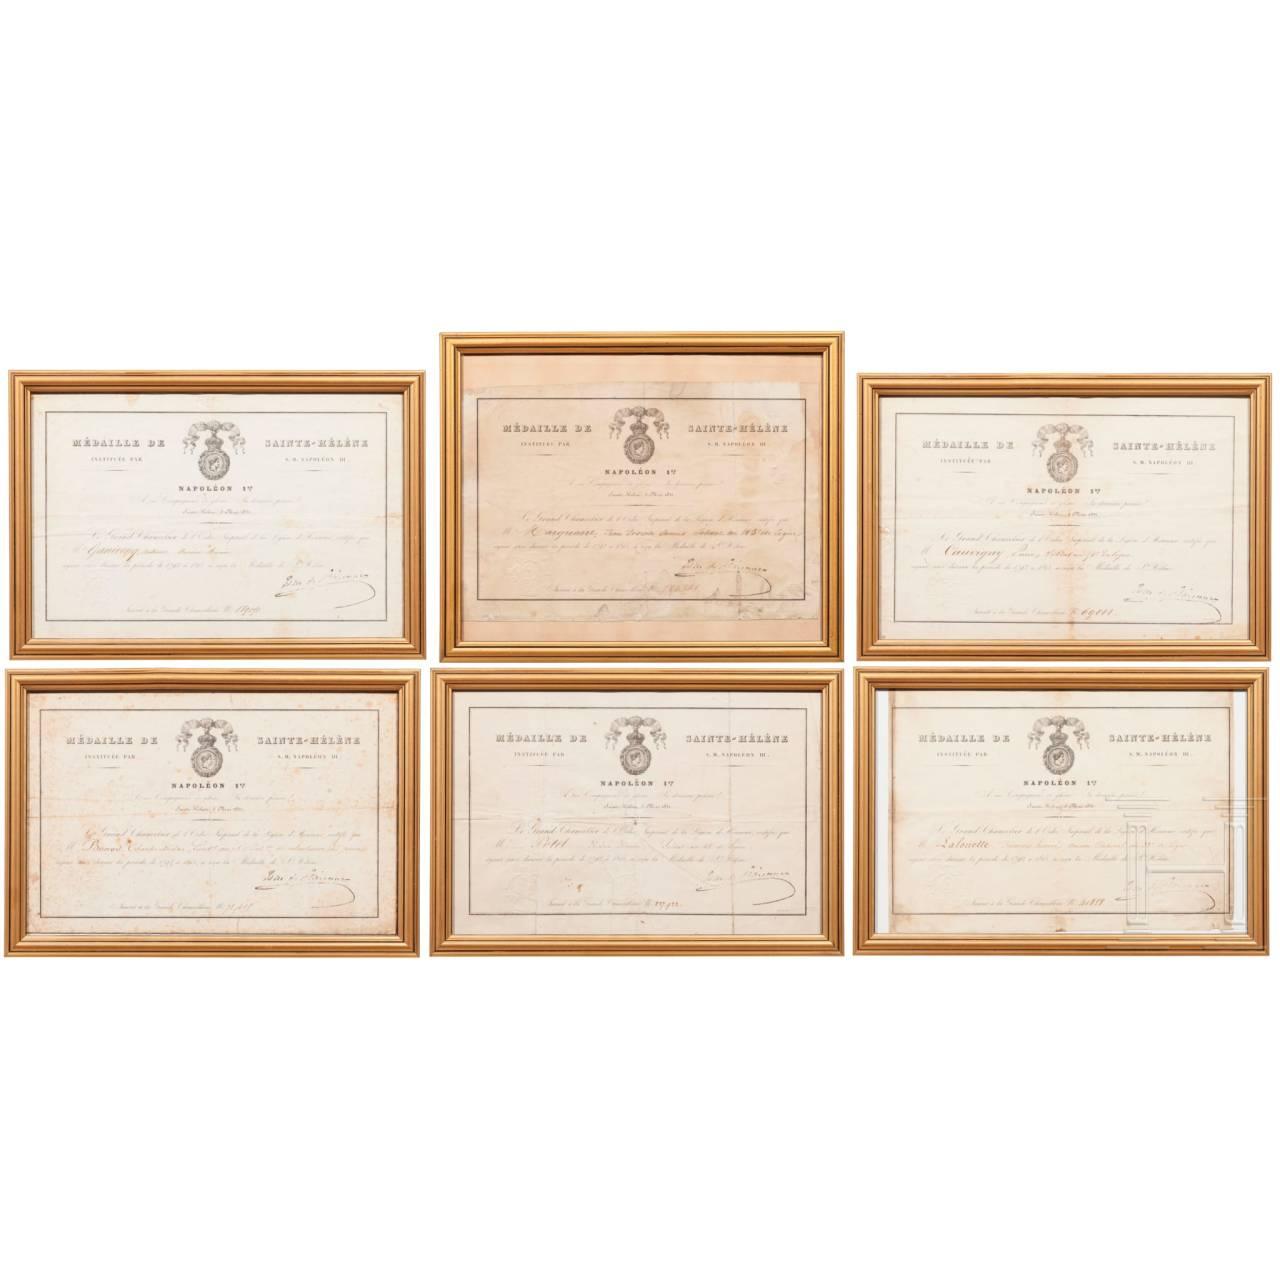 Sechs Urkunden zur Sankt Helena-Medaille